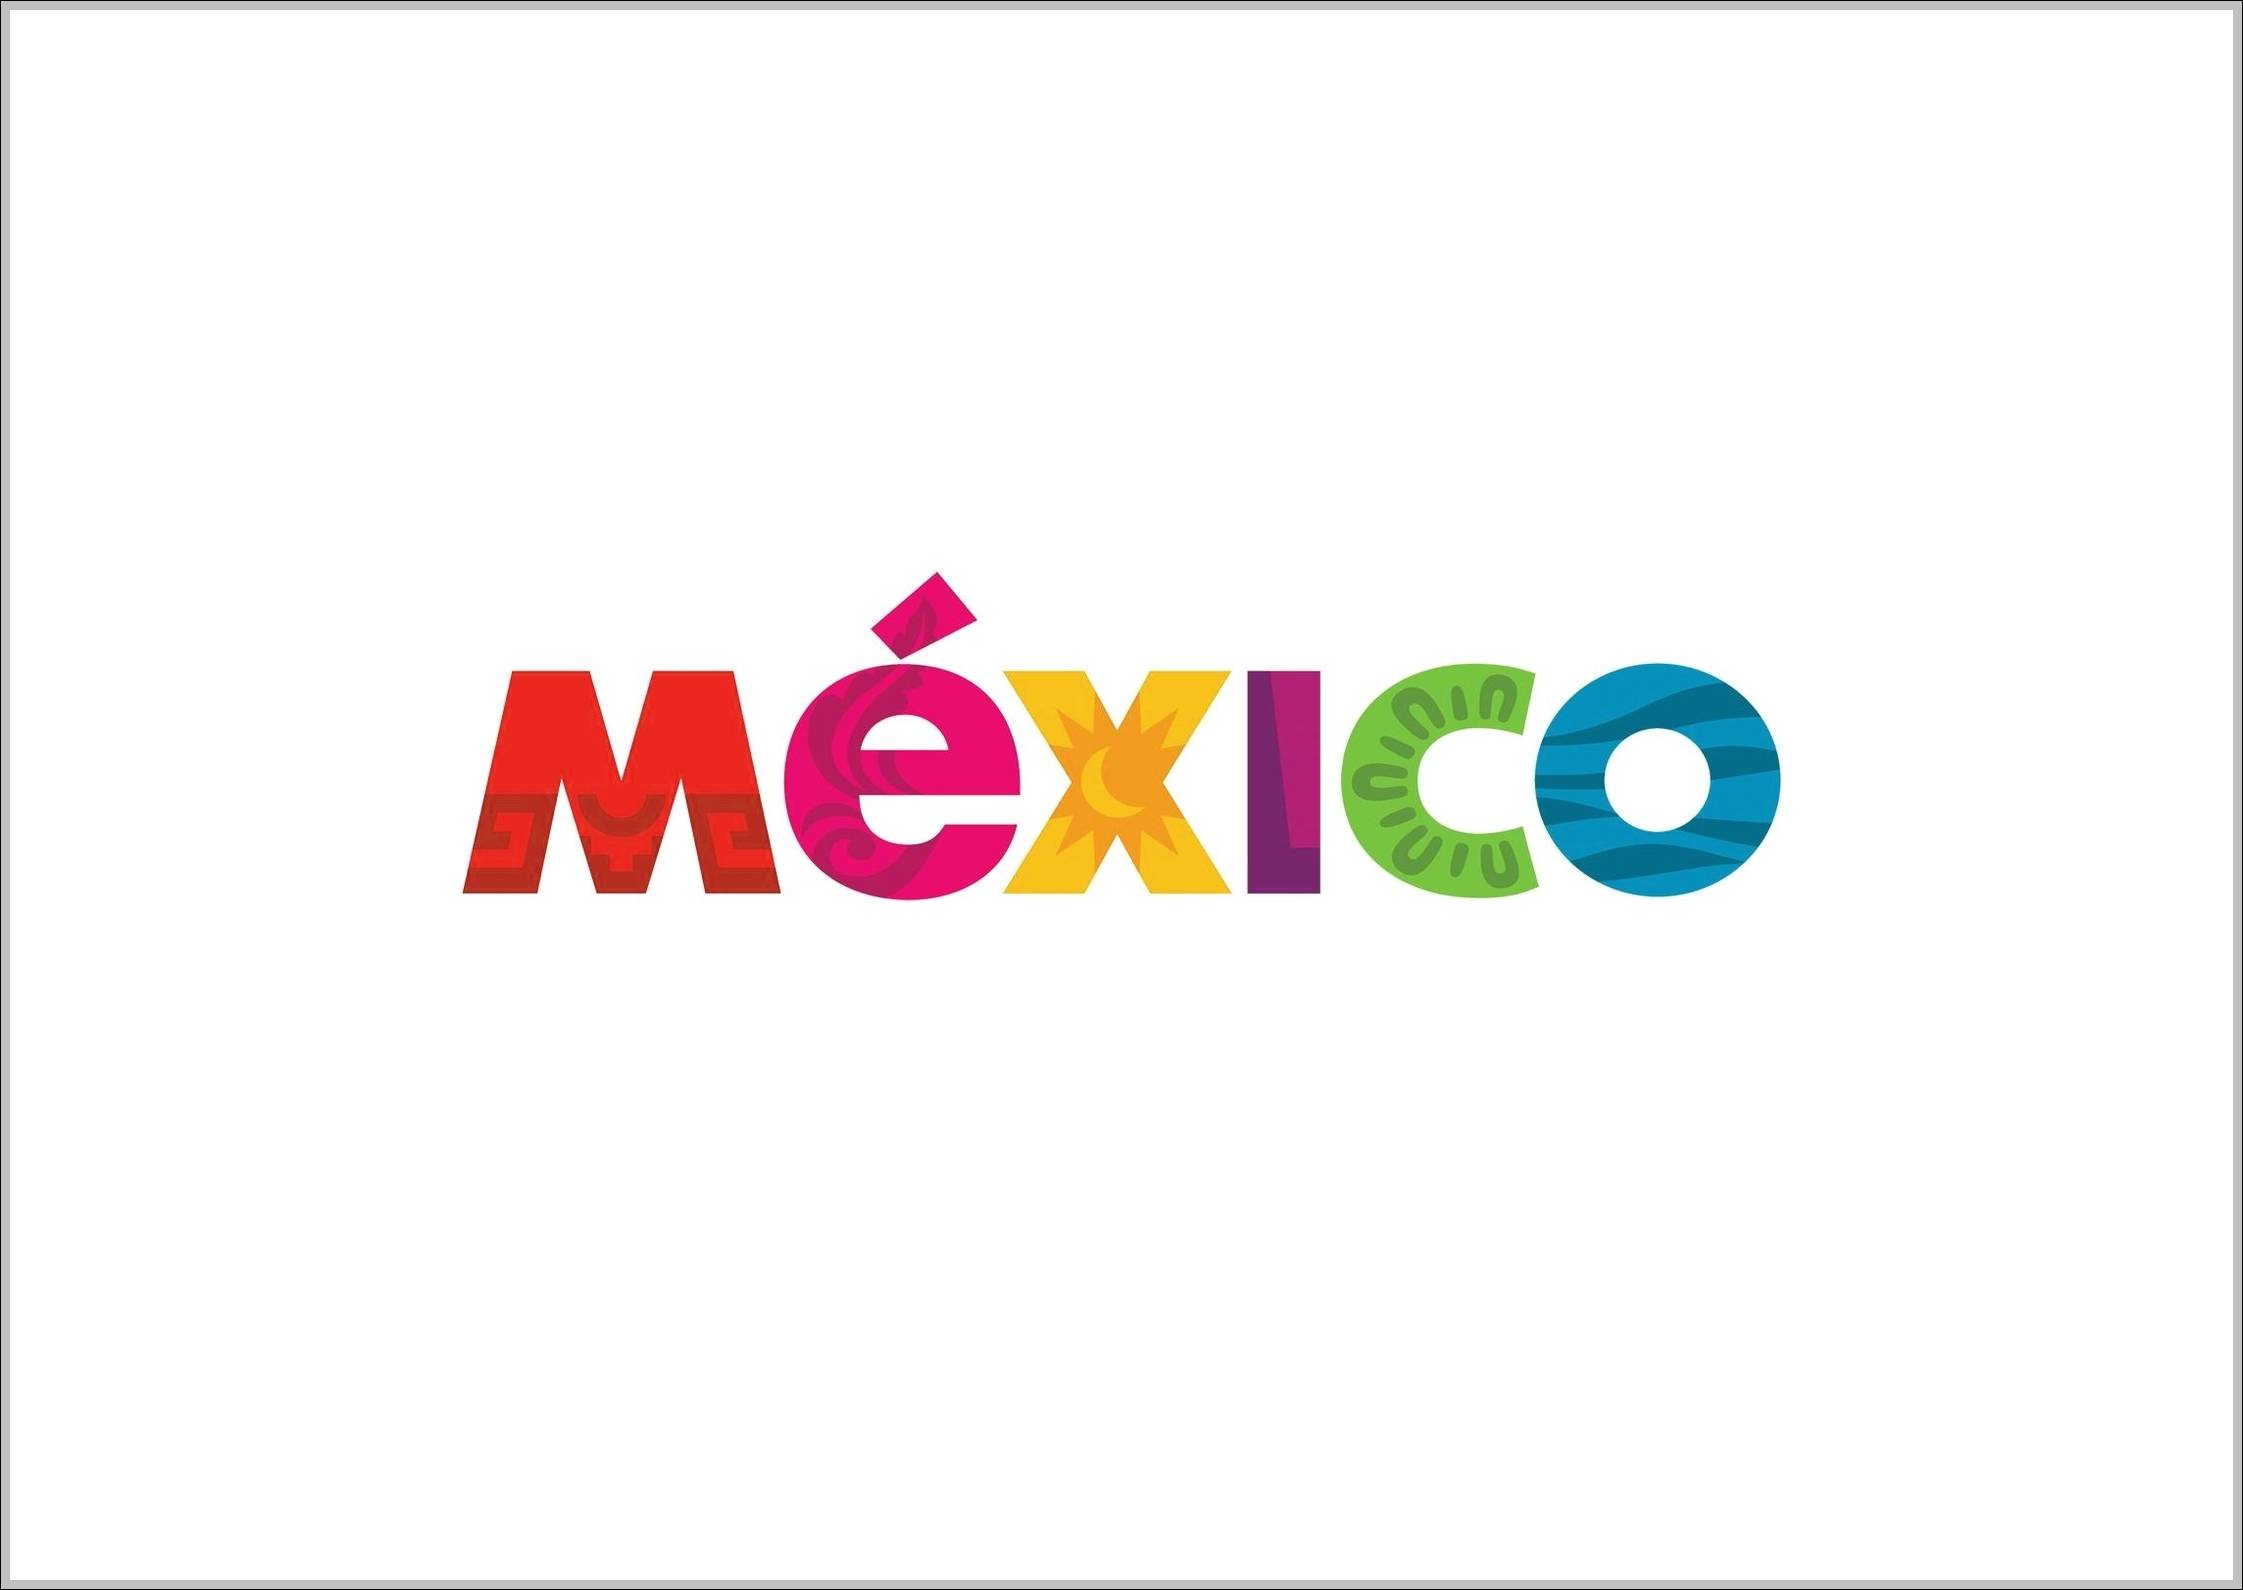 Visit Mexico logo